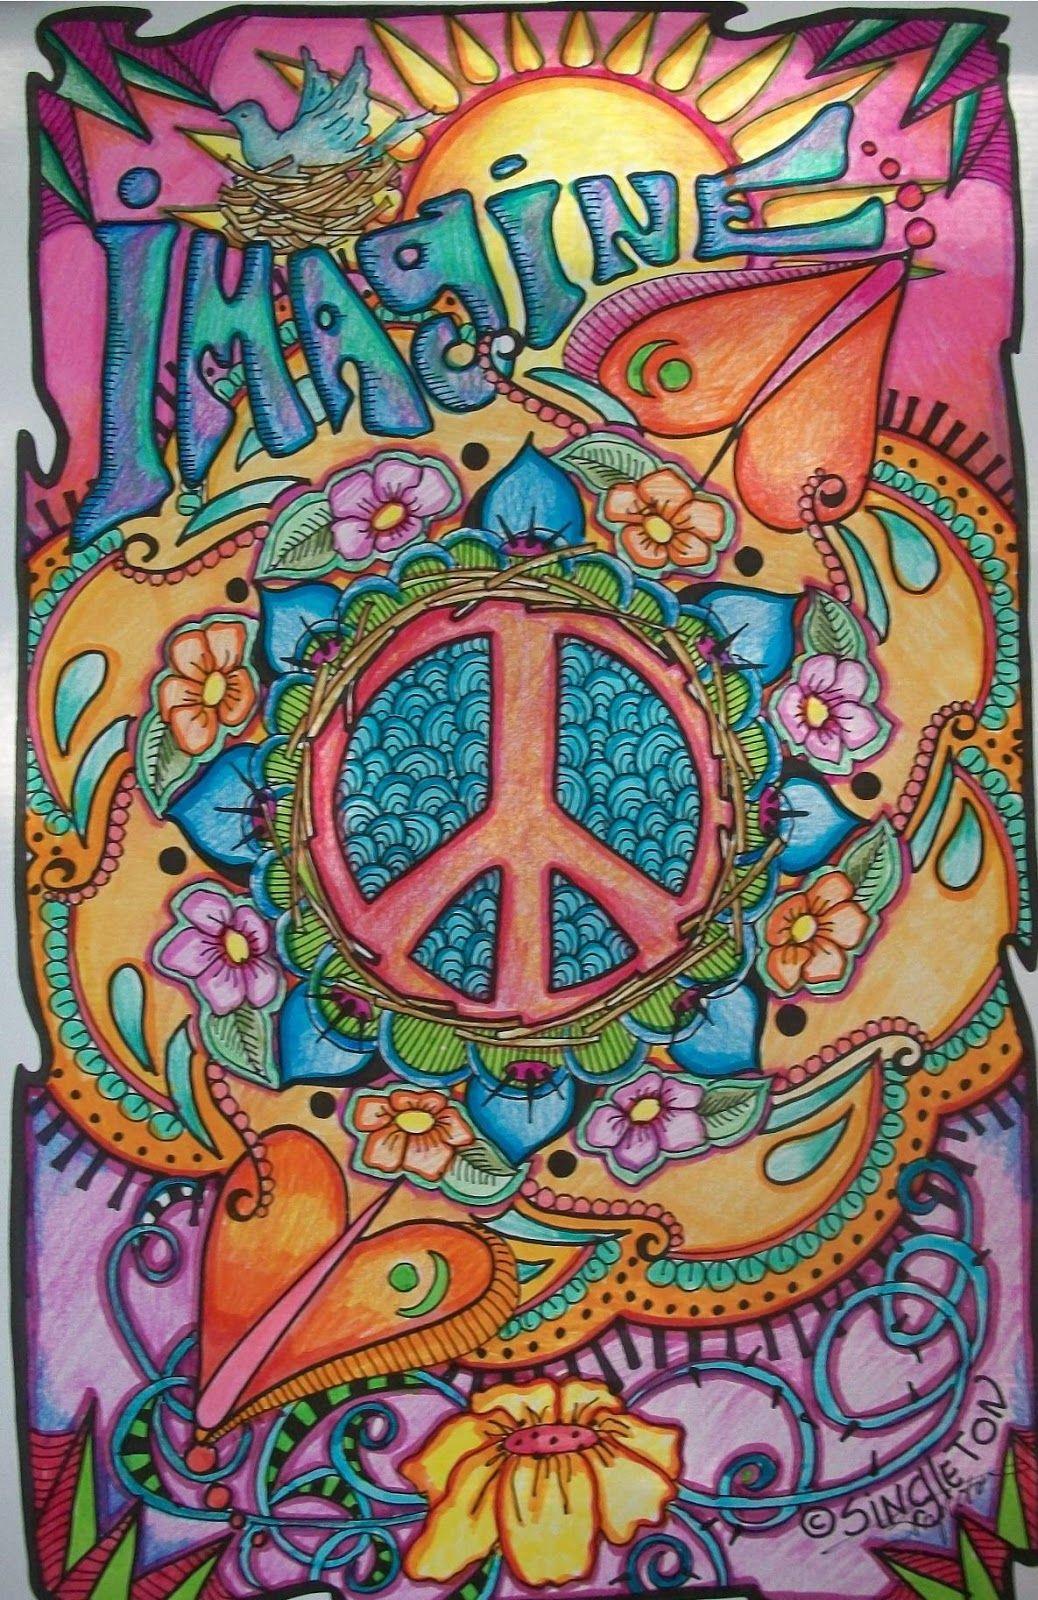 Resultado de imagen para hippie art | Psicodélico | Pinterest ...